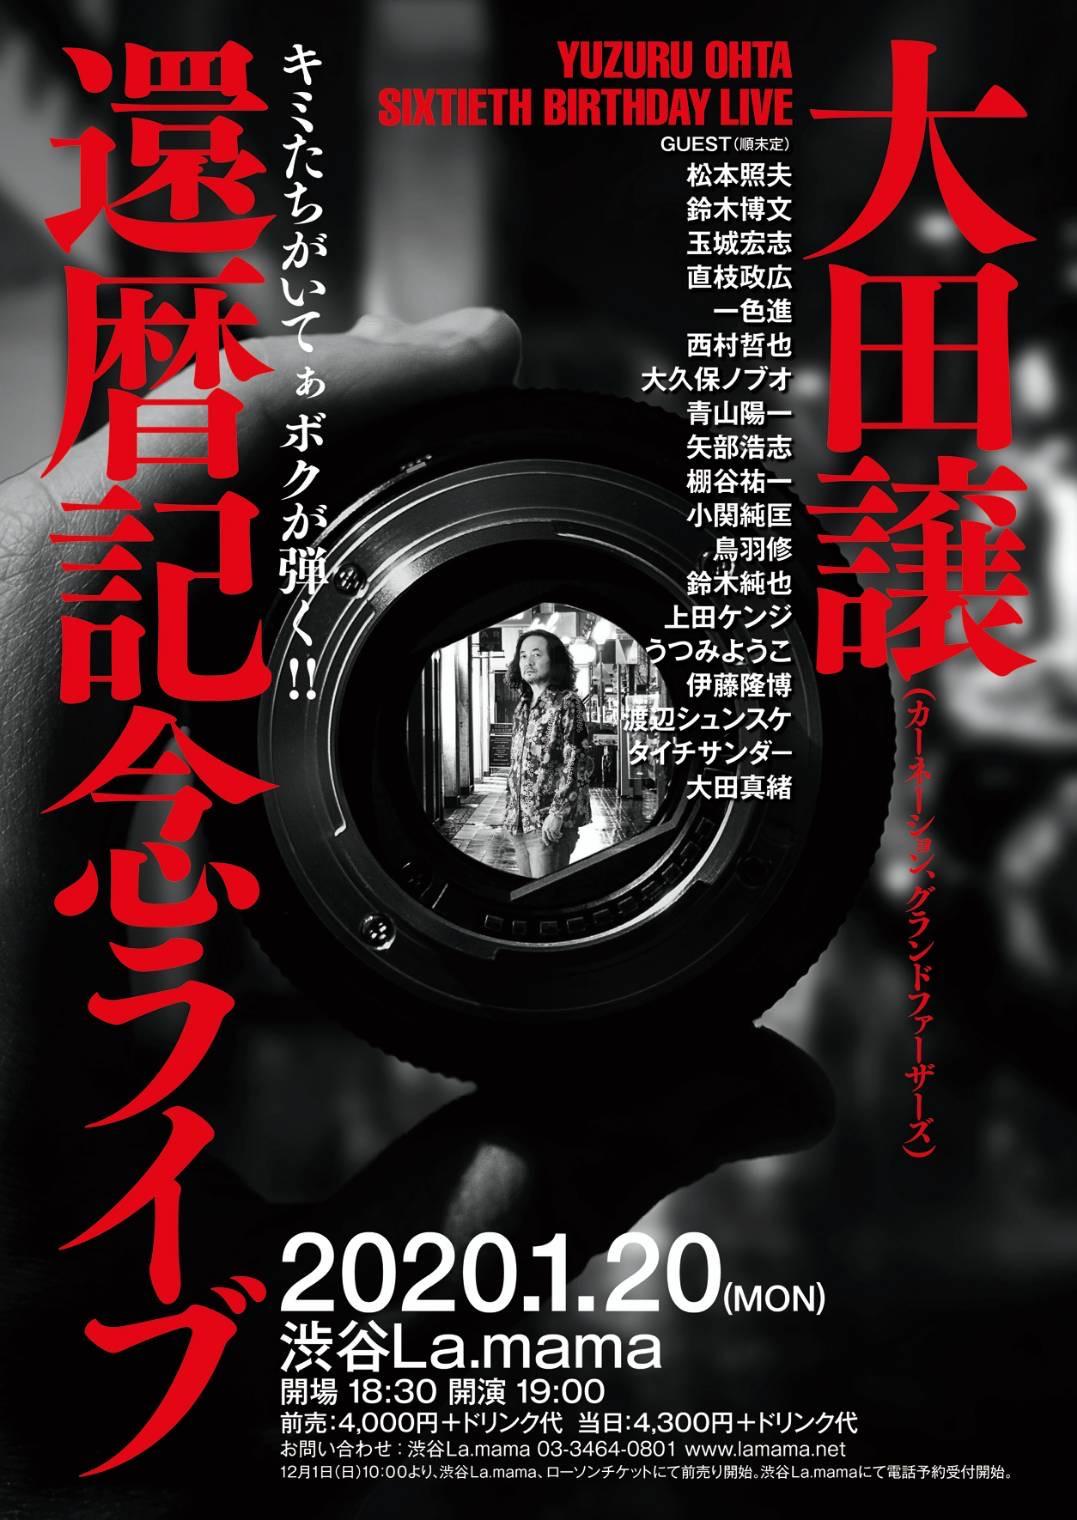 http://www.carnation-web.com/news/IMG_1014.JPG